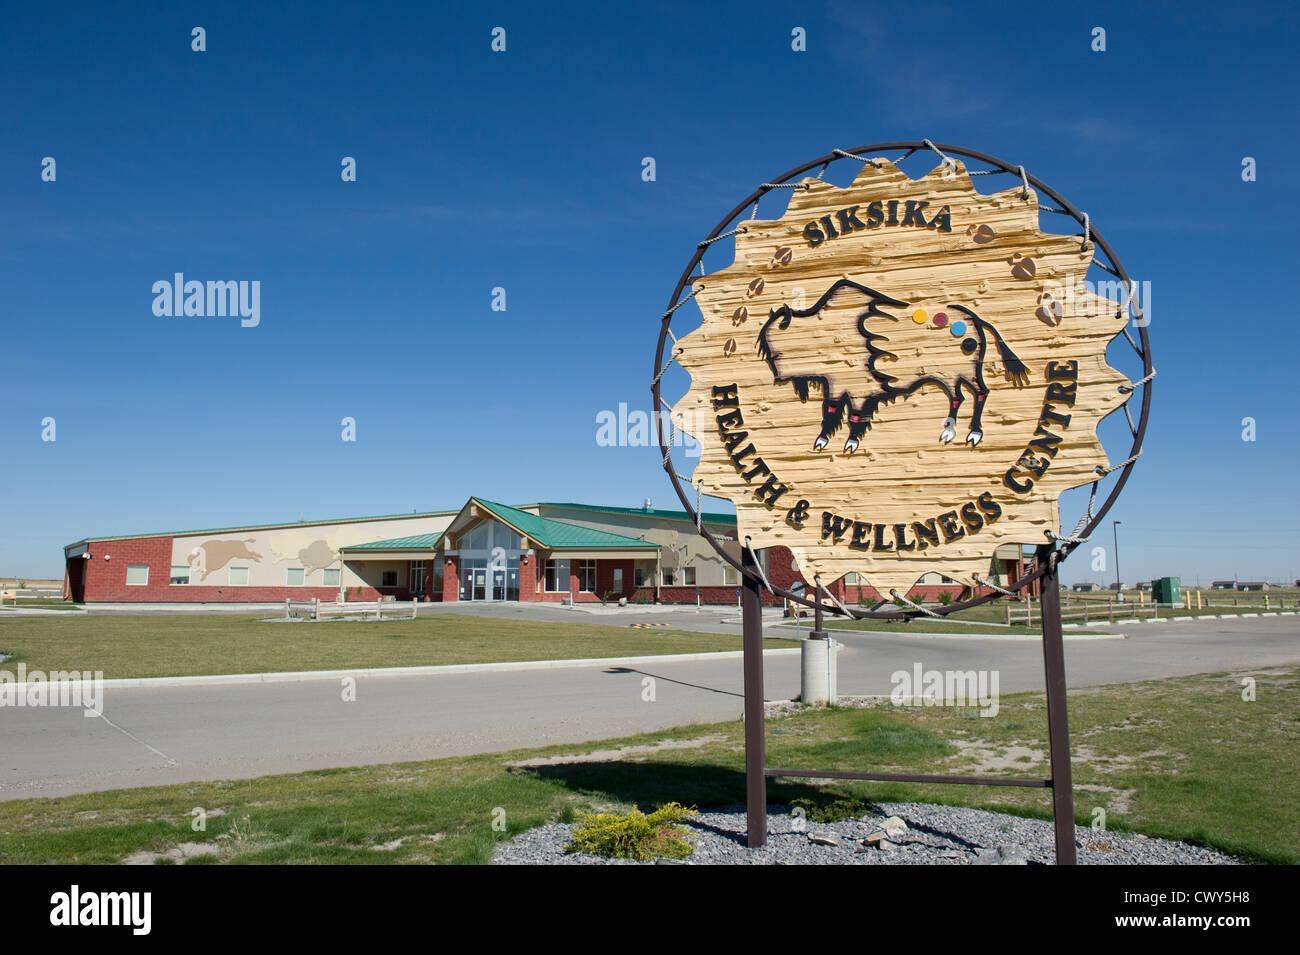 Siksika  Health and Welfare Centre , Siksika Alberta Canada - Stock Image